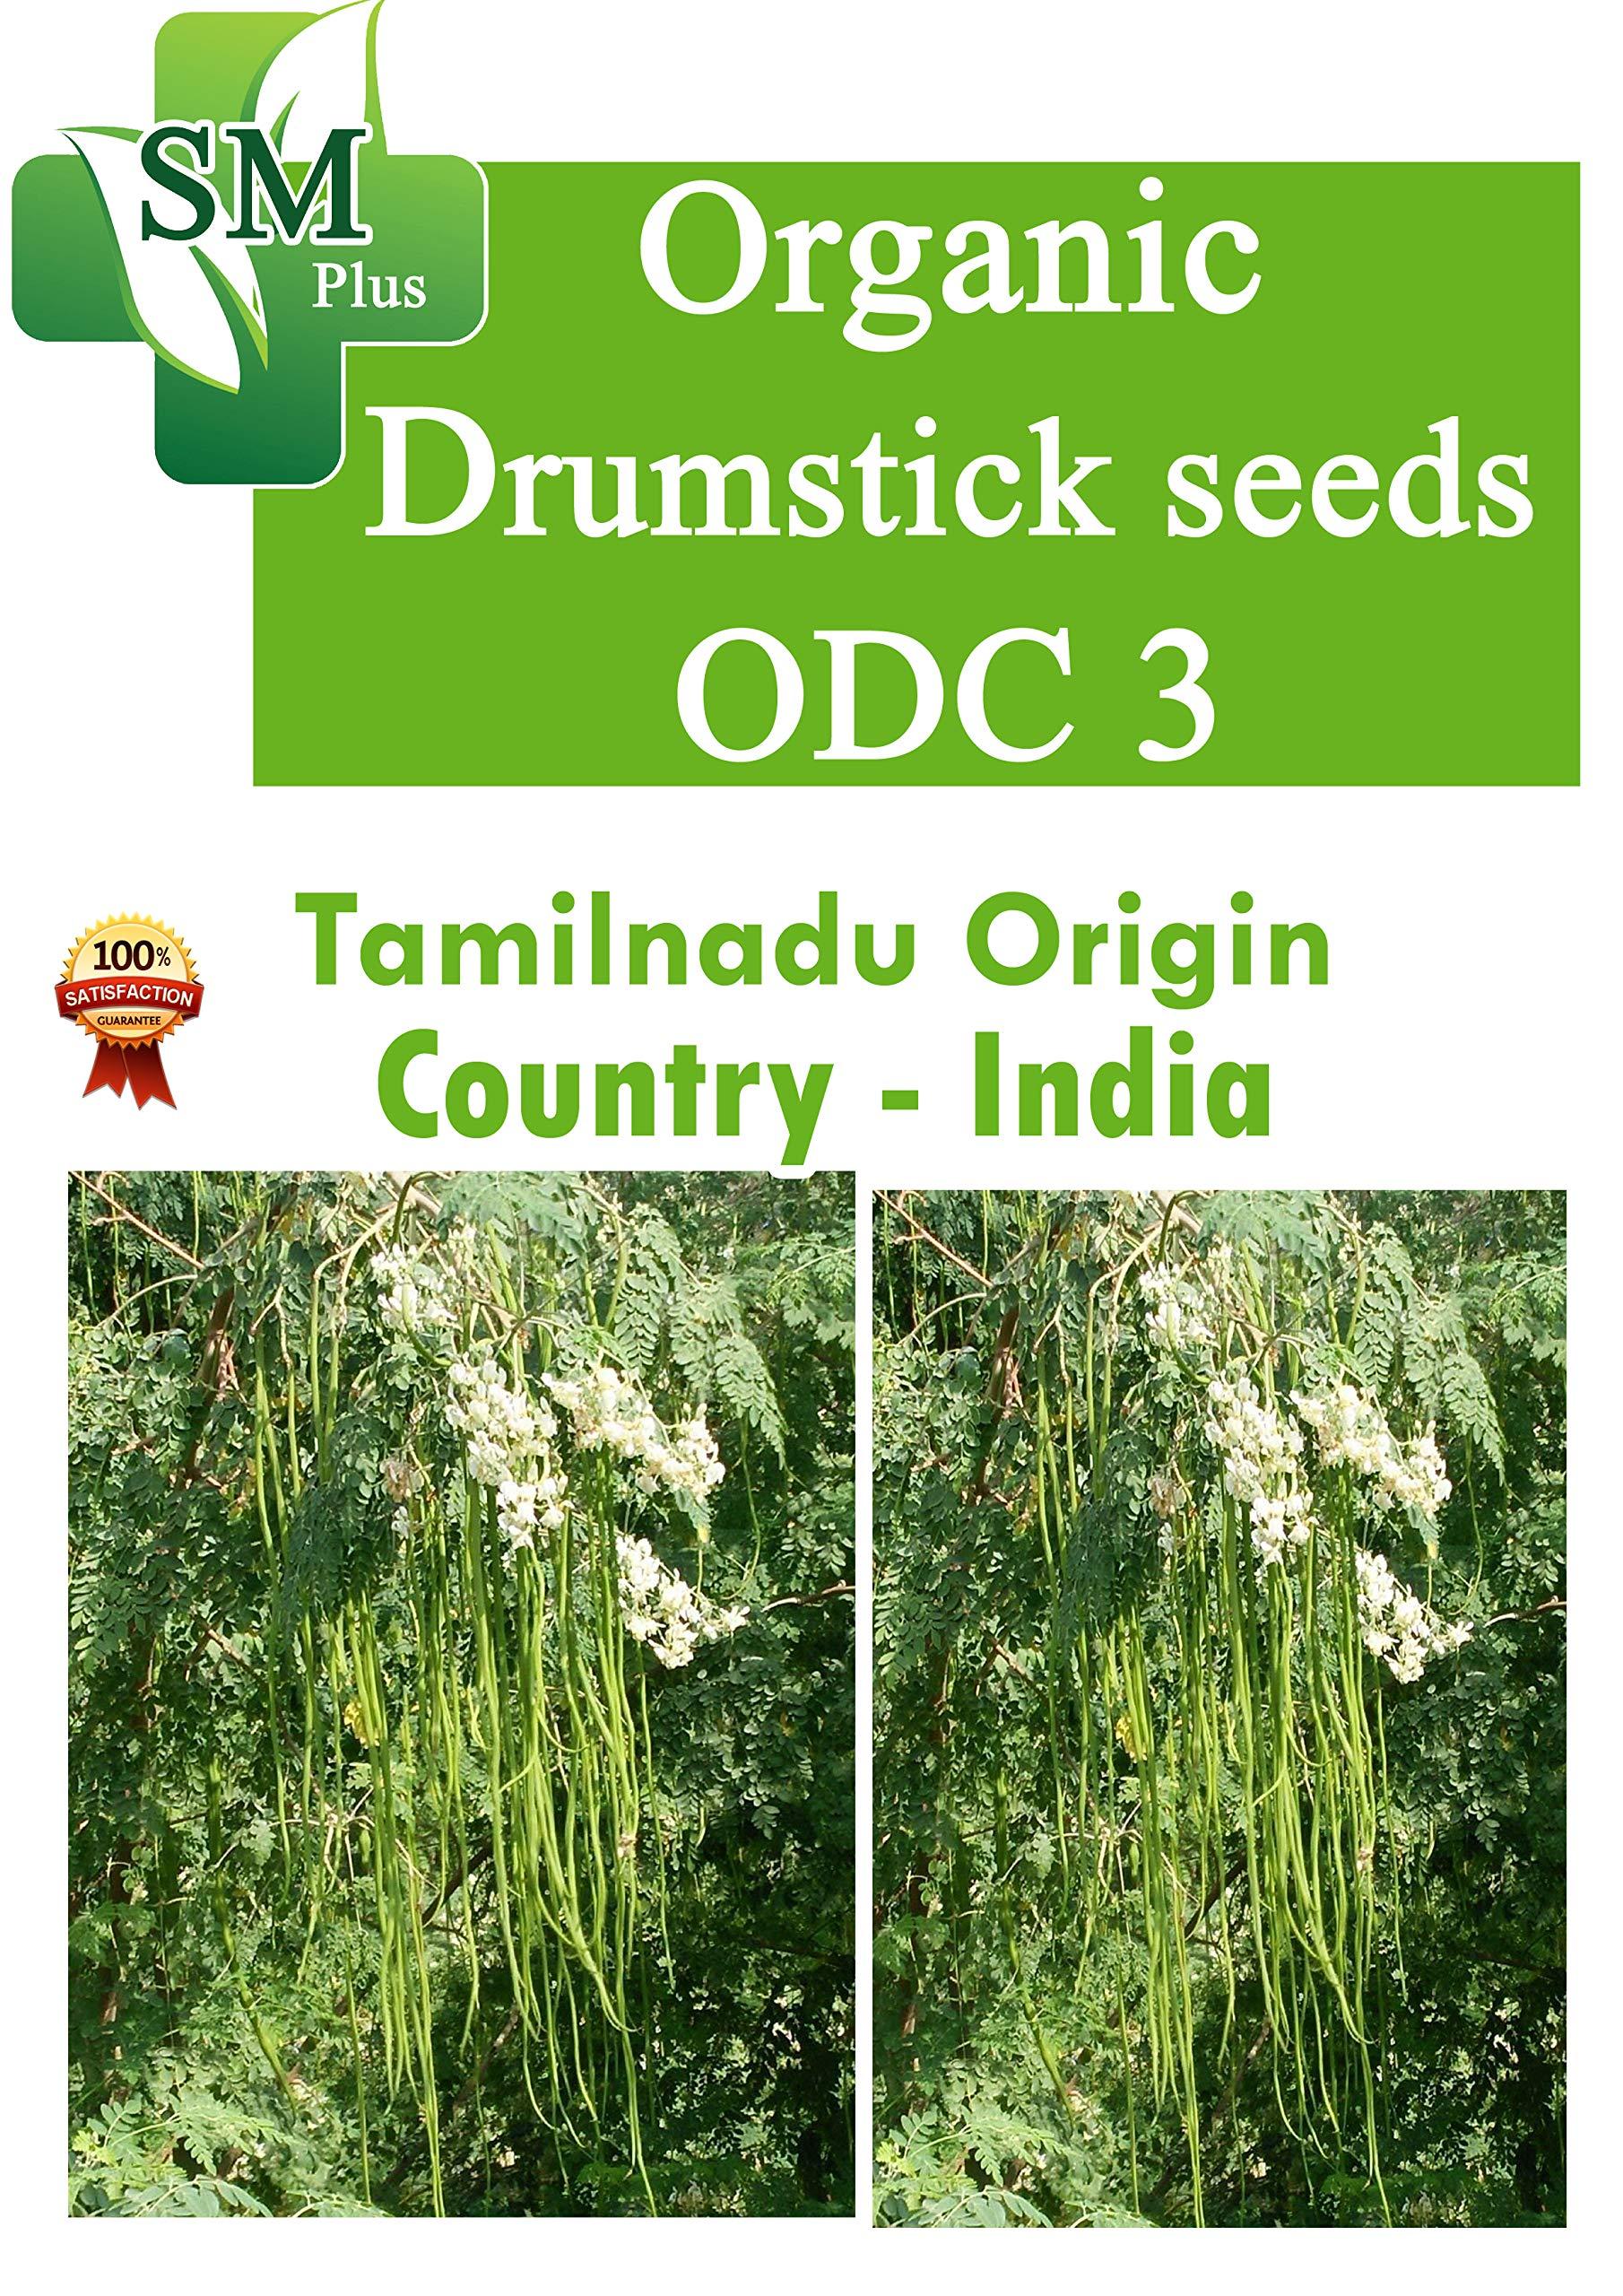 riyo Fedrick Moringa ODC 3 Drumstick Seeds (250 g, 1000 Seeds) (B07P942PKZ) Amazon Price History, Amazon Price Tracker